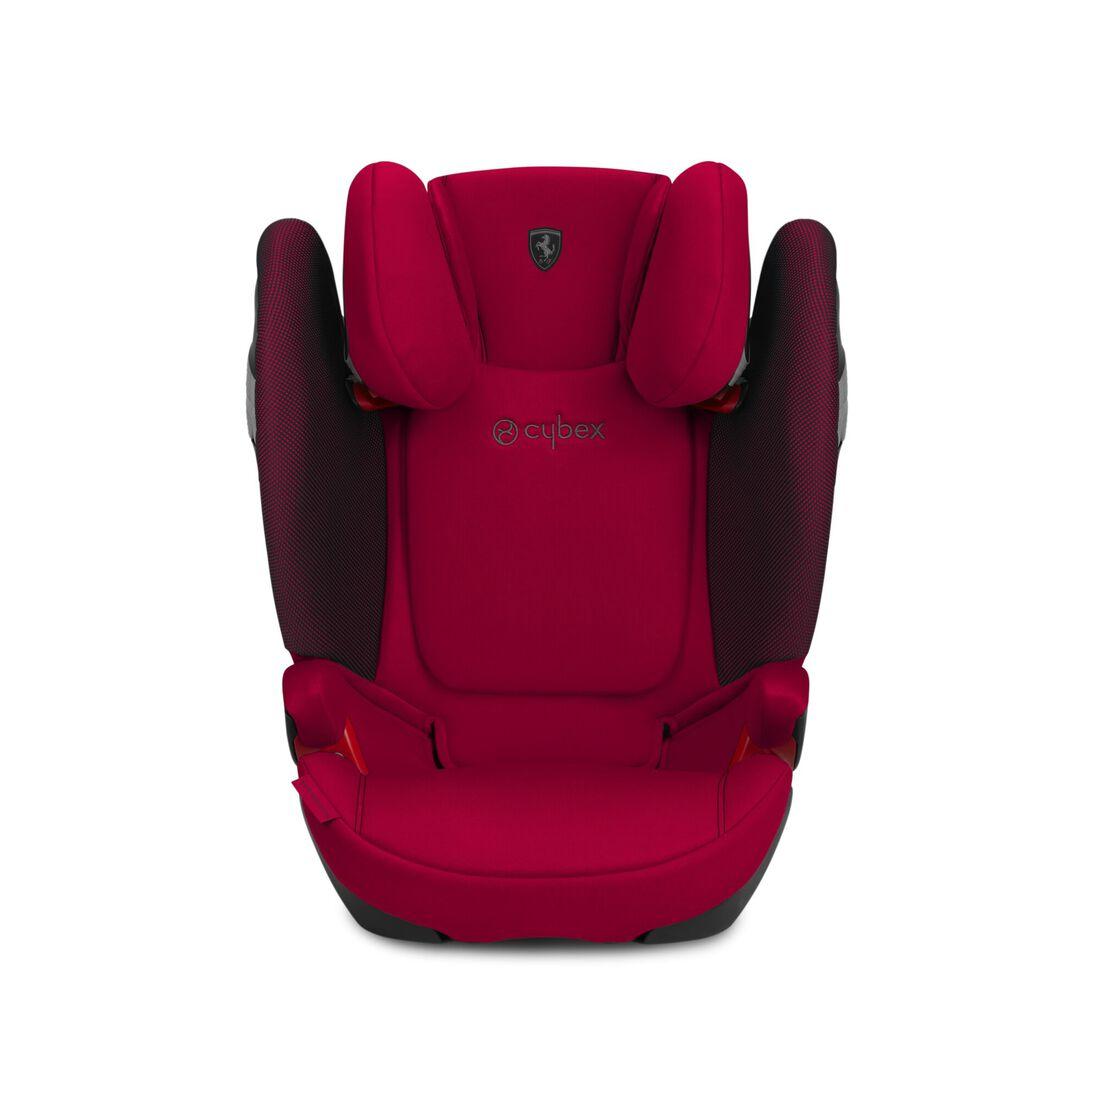 CYBEX Solution S-fix - Ferrari Racing Red in Ferrari Racing Red large Bild 2